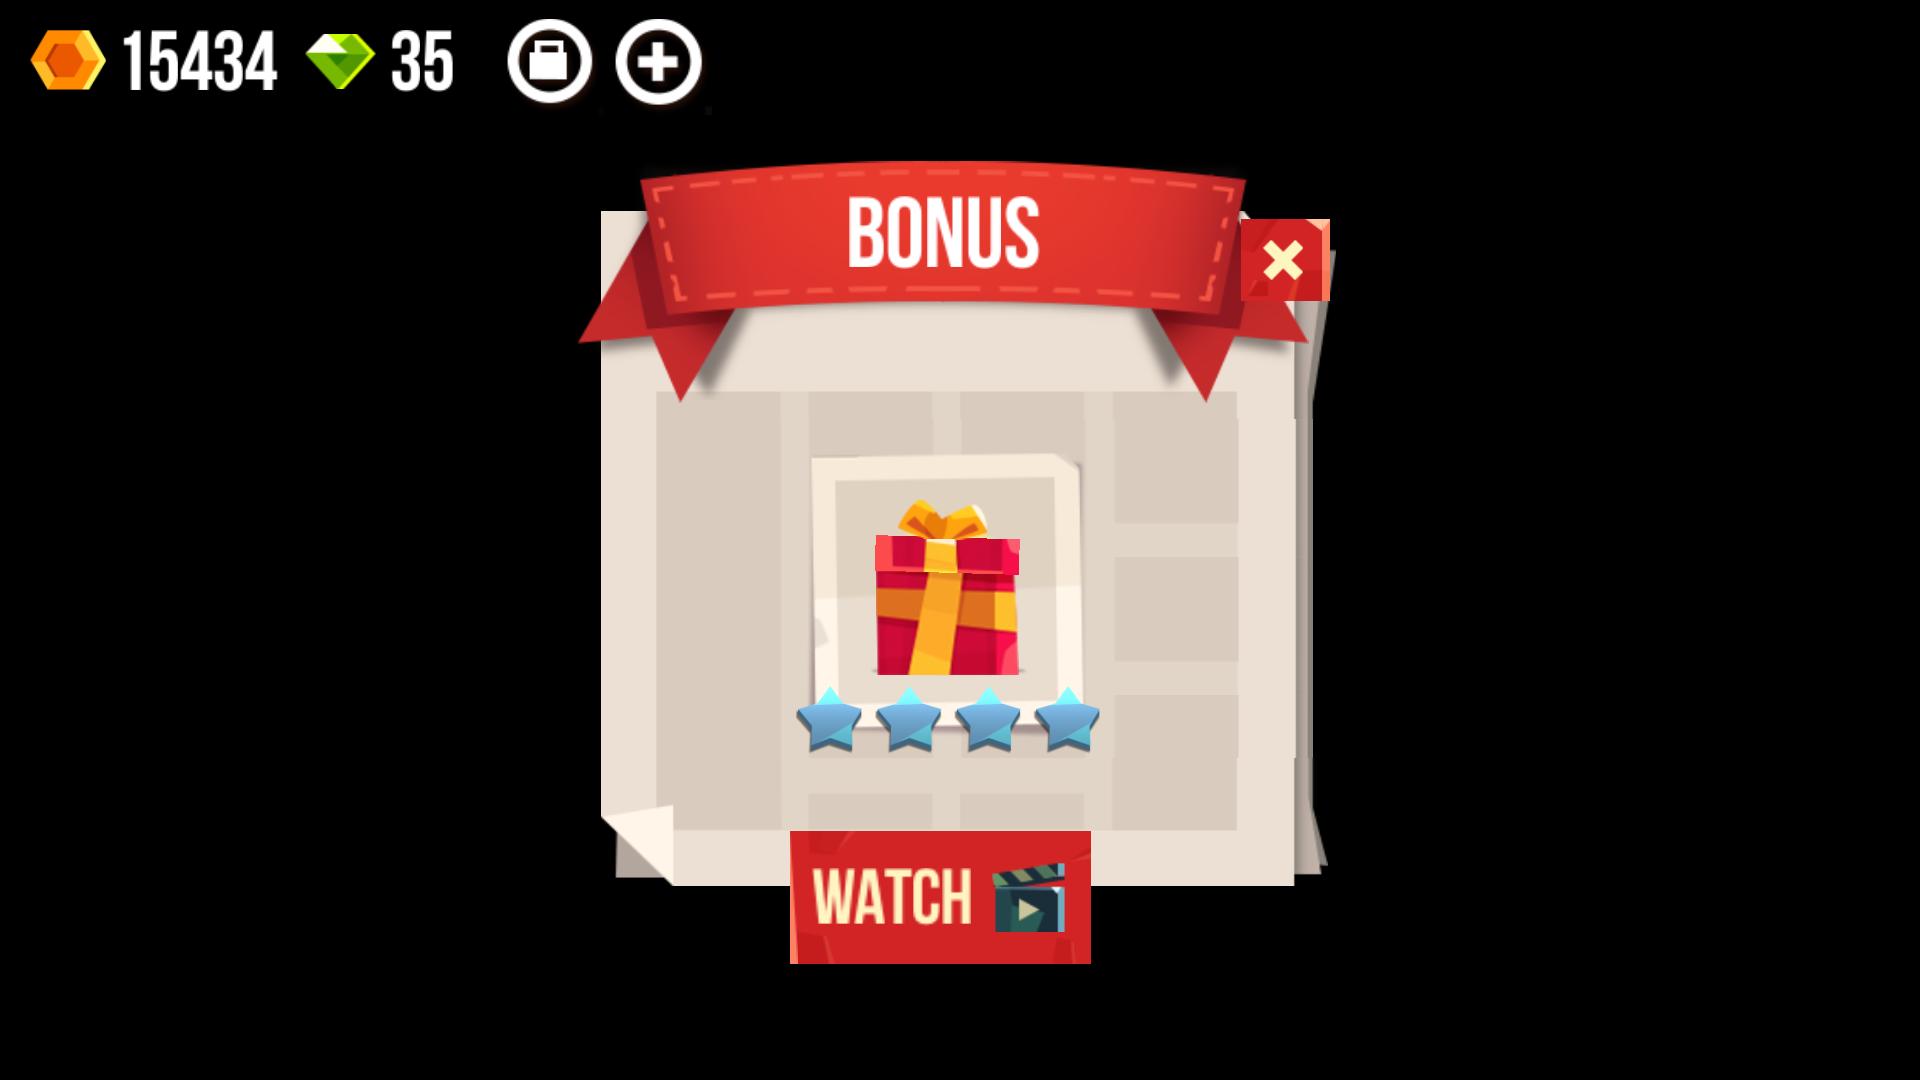 Bonus Box for Video Ads